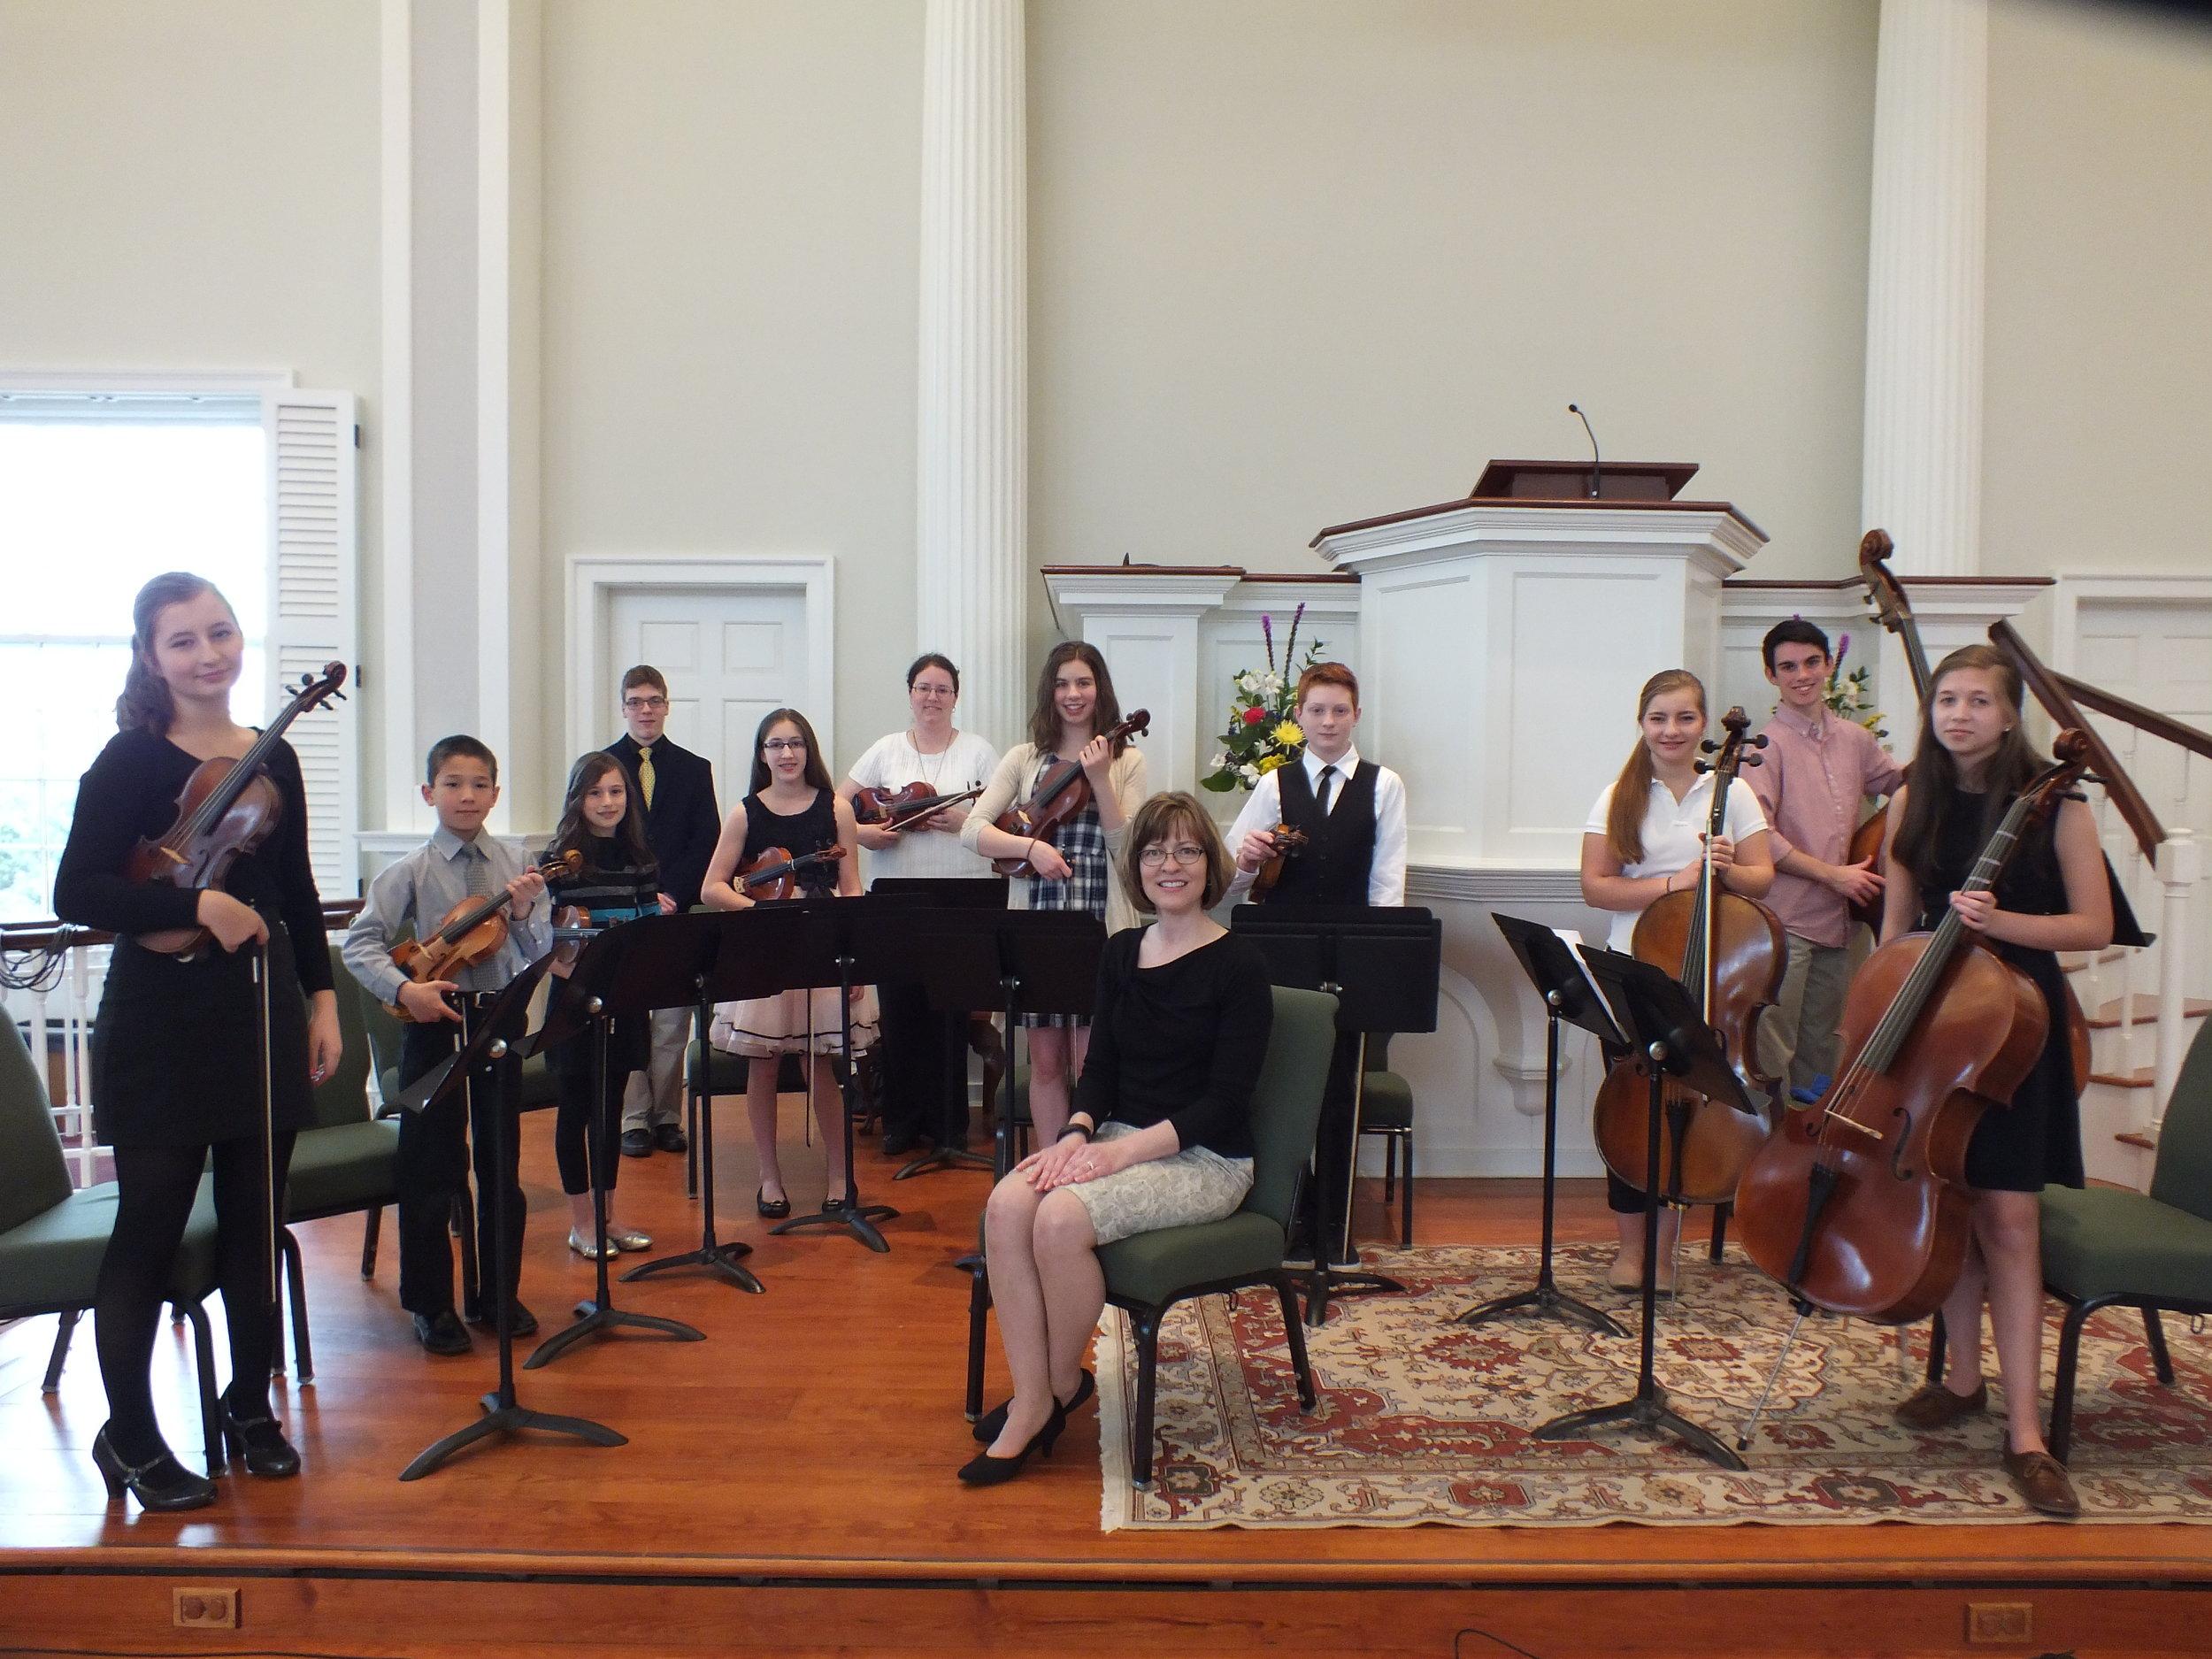 Youth String Ensemble - Carolyn McLain, Director